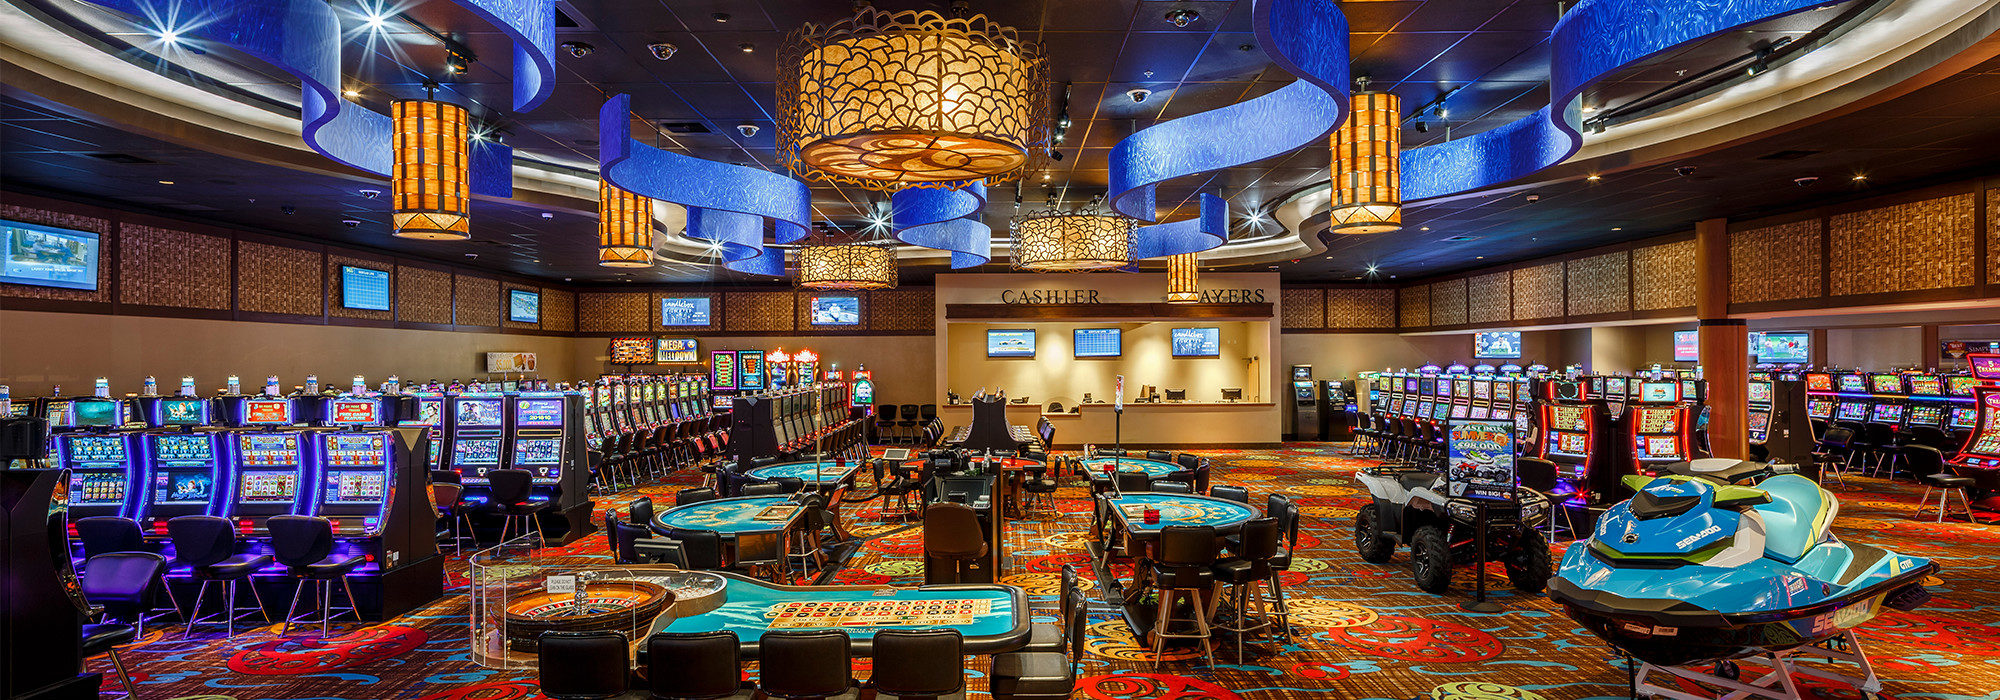 Little creek nonsmoking casino